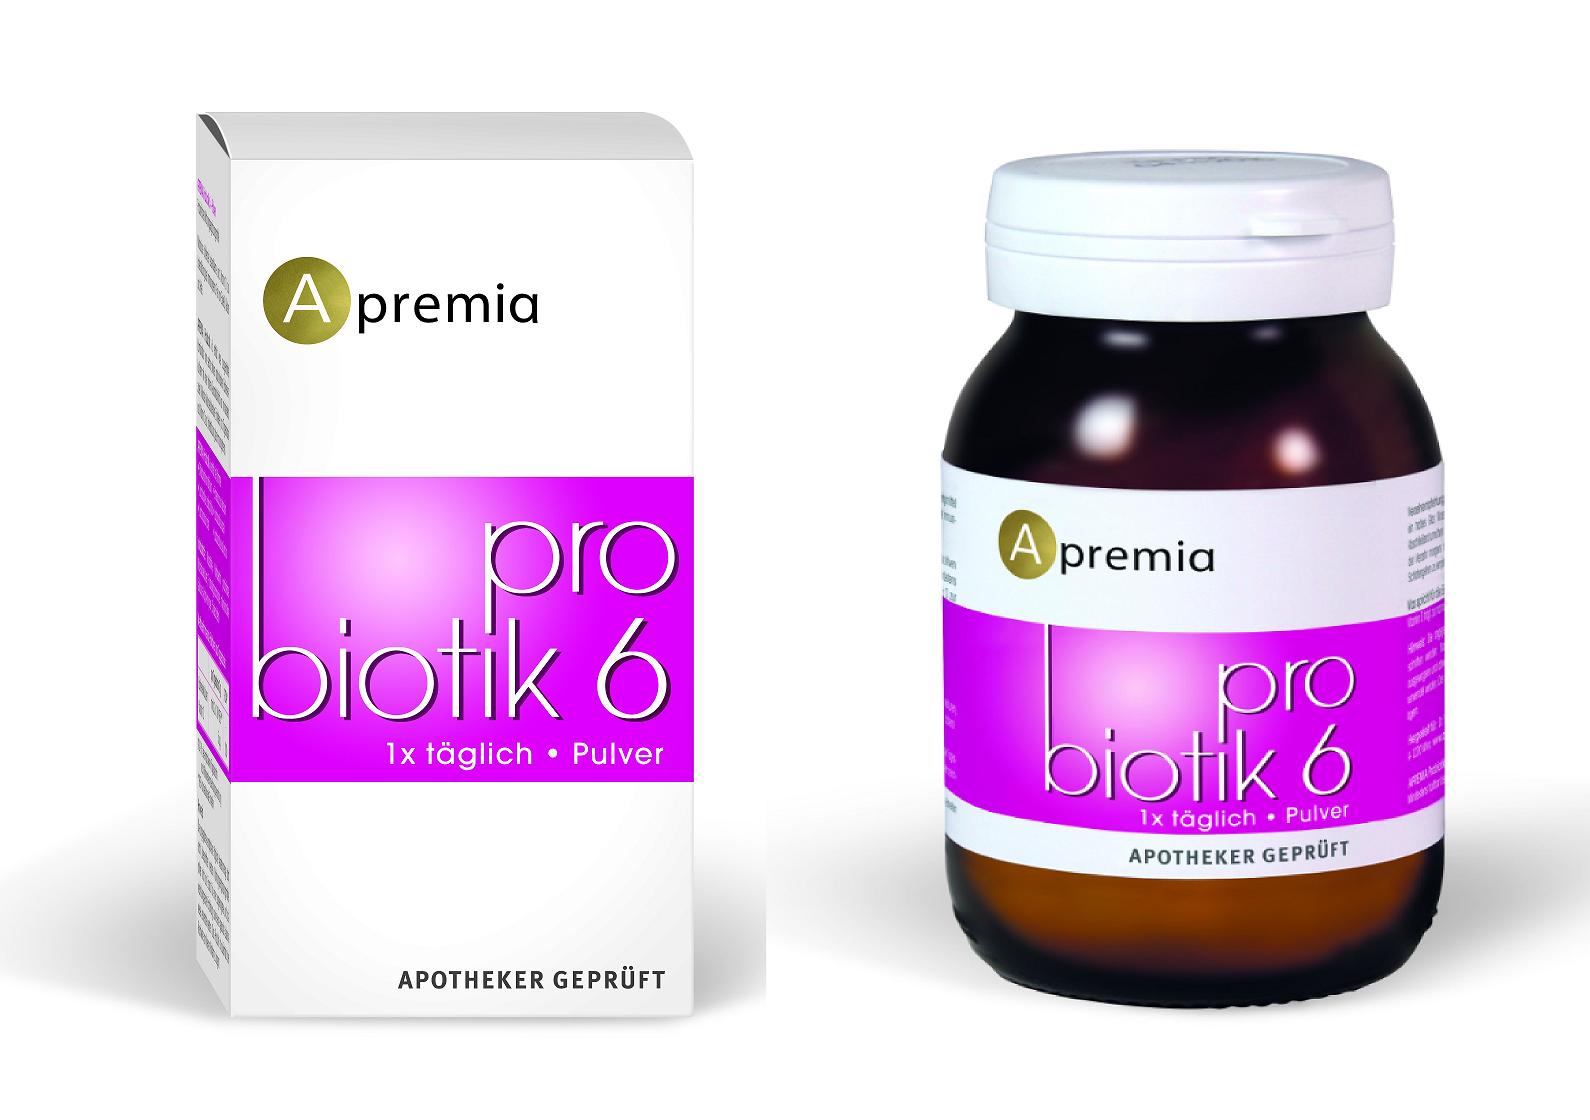 APREMIA Probiotik 6